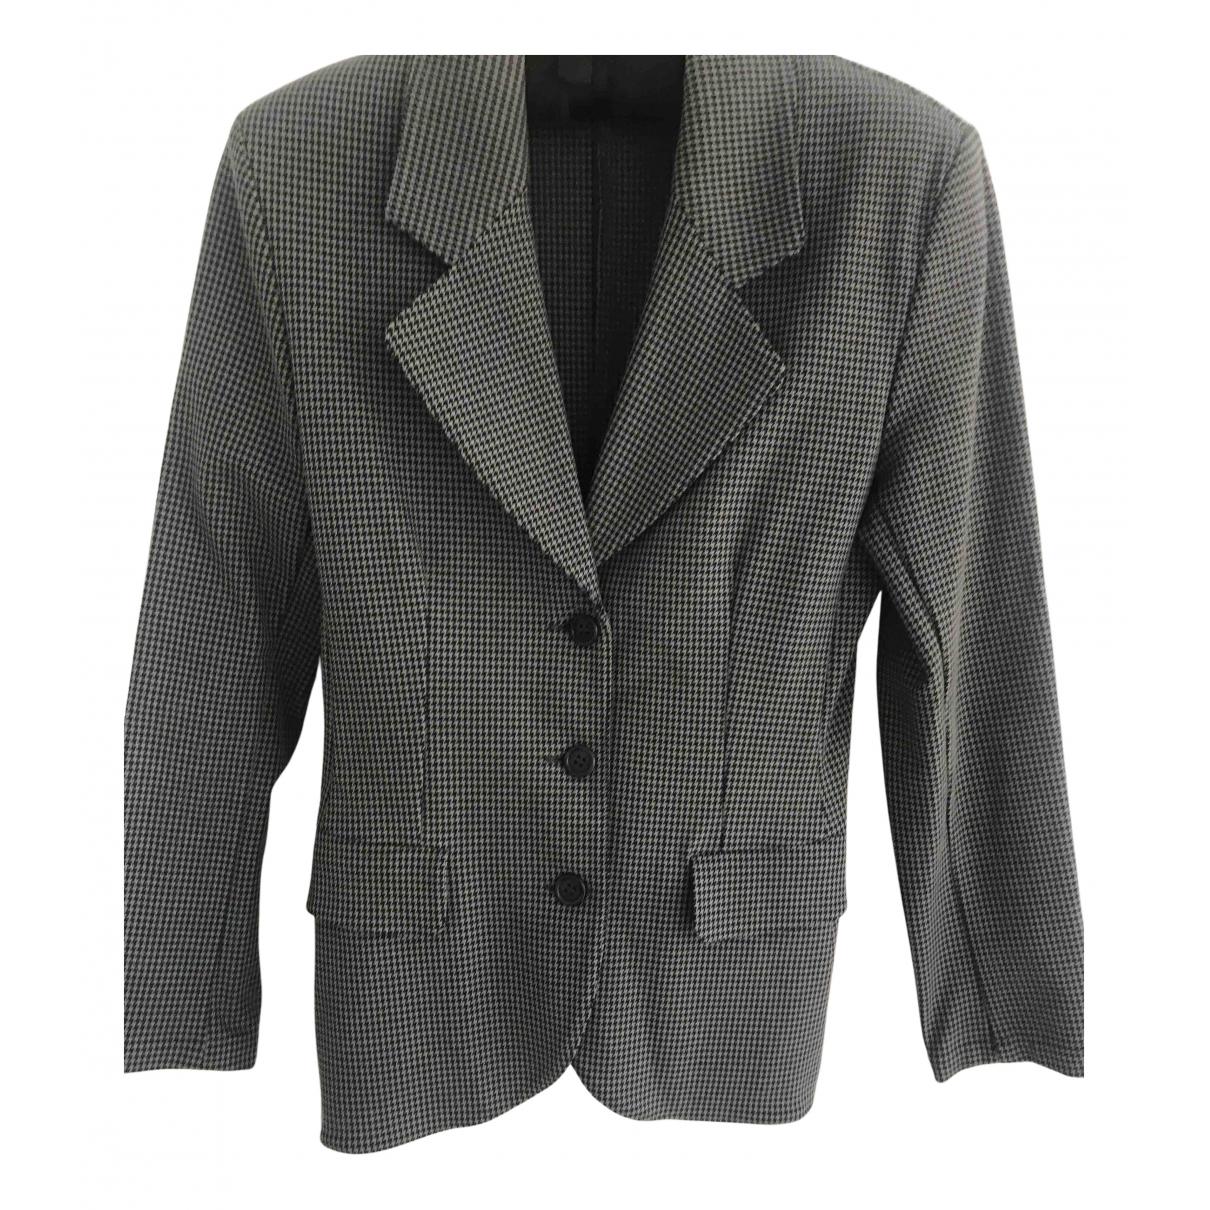 Cacharel N Grey jacket for Women 38 FR